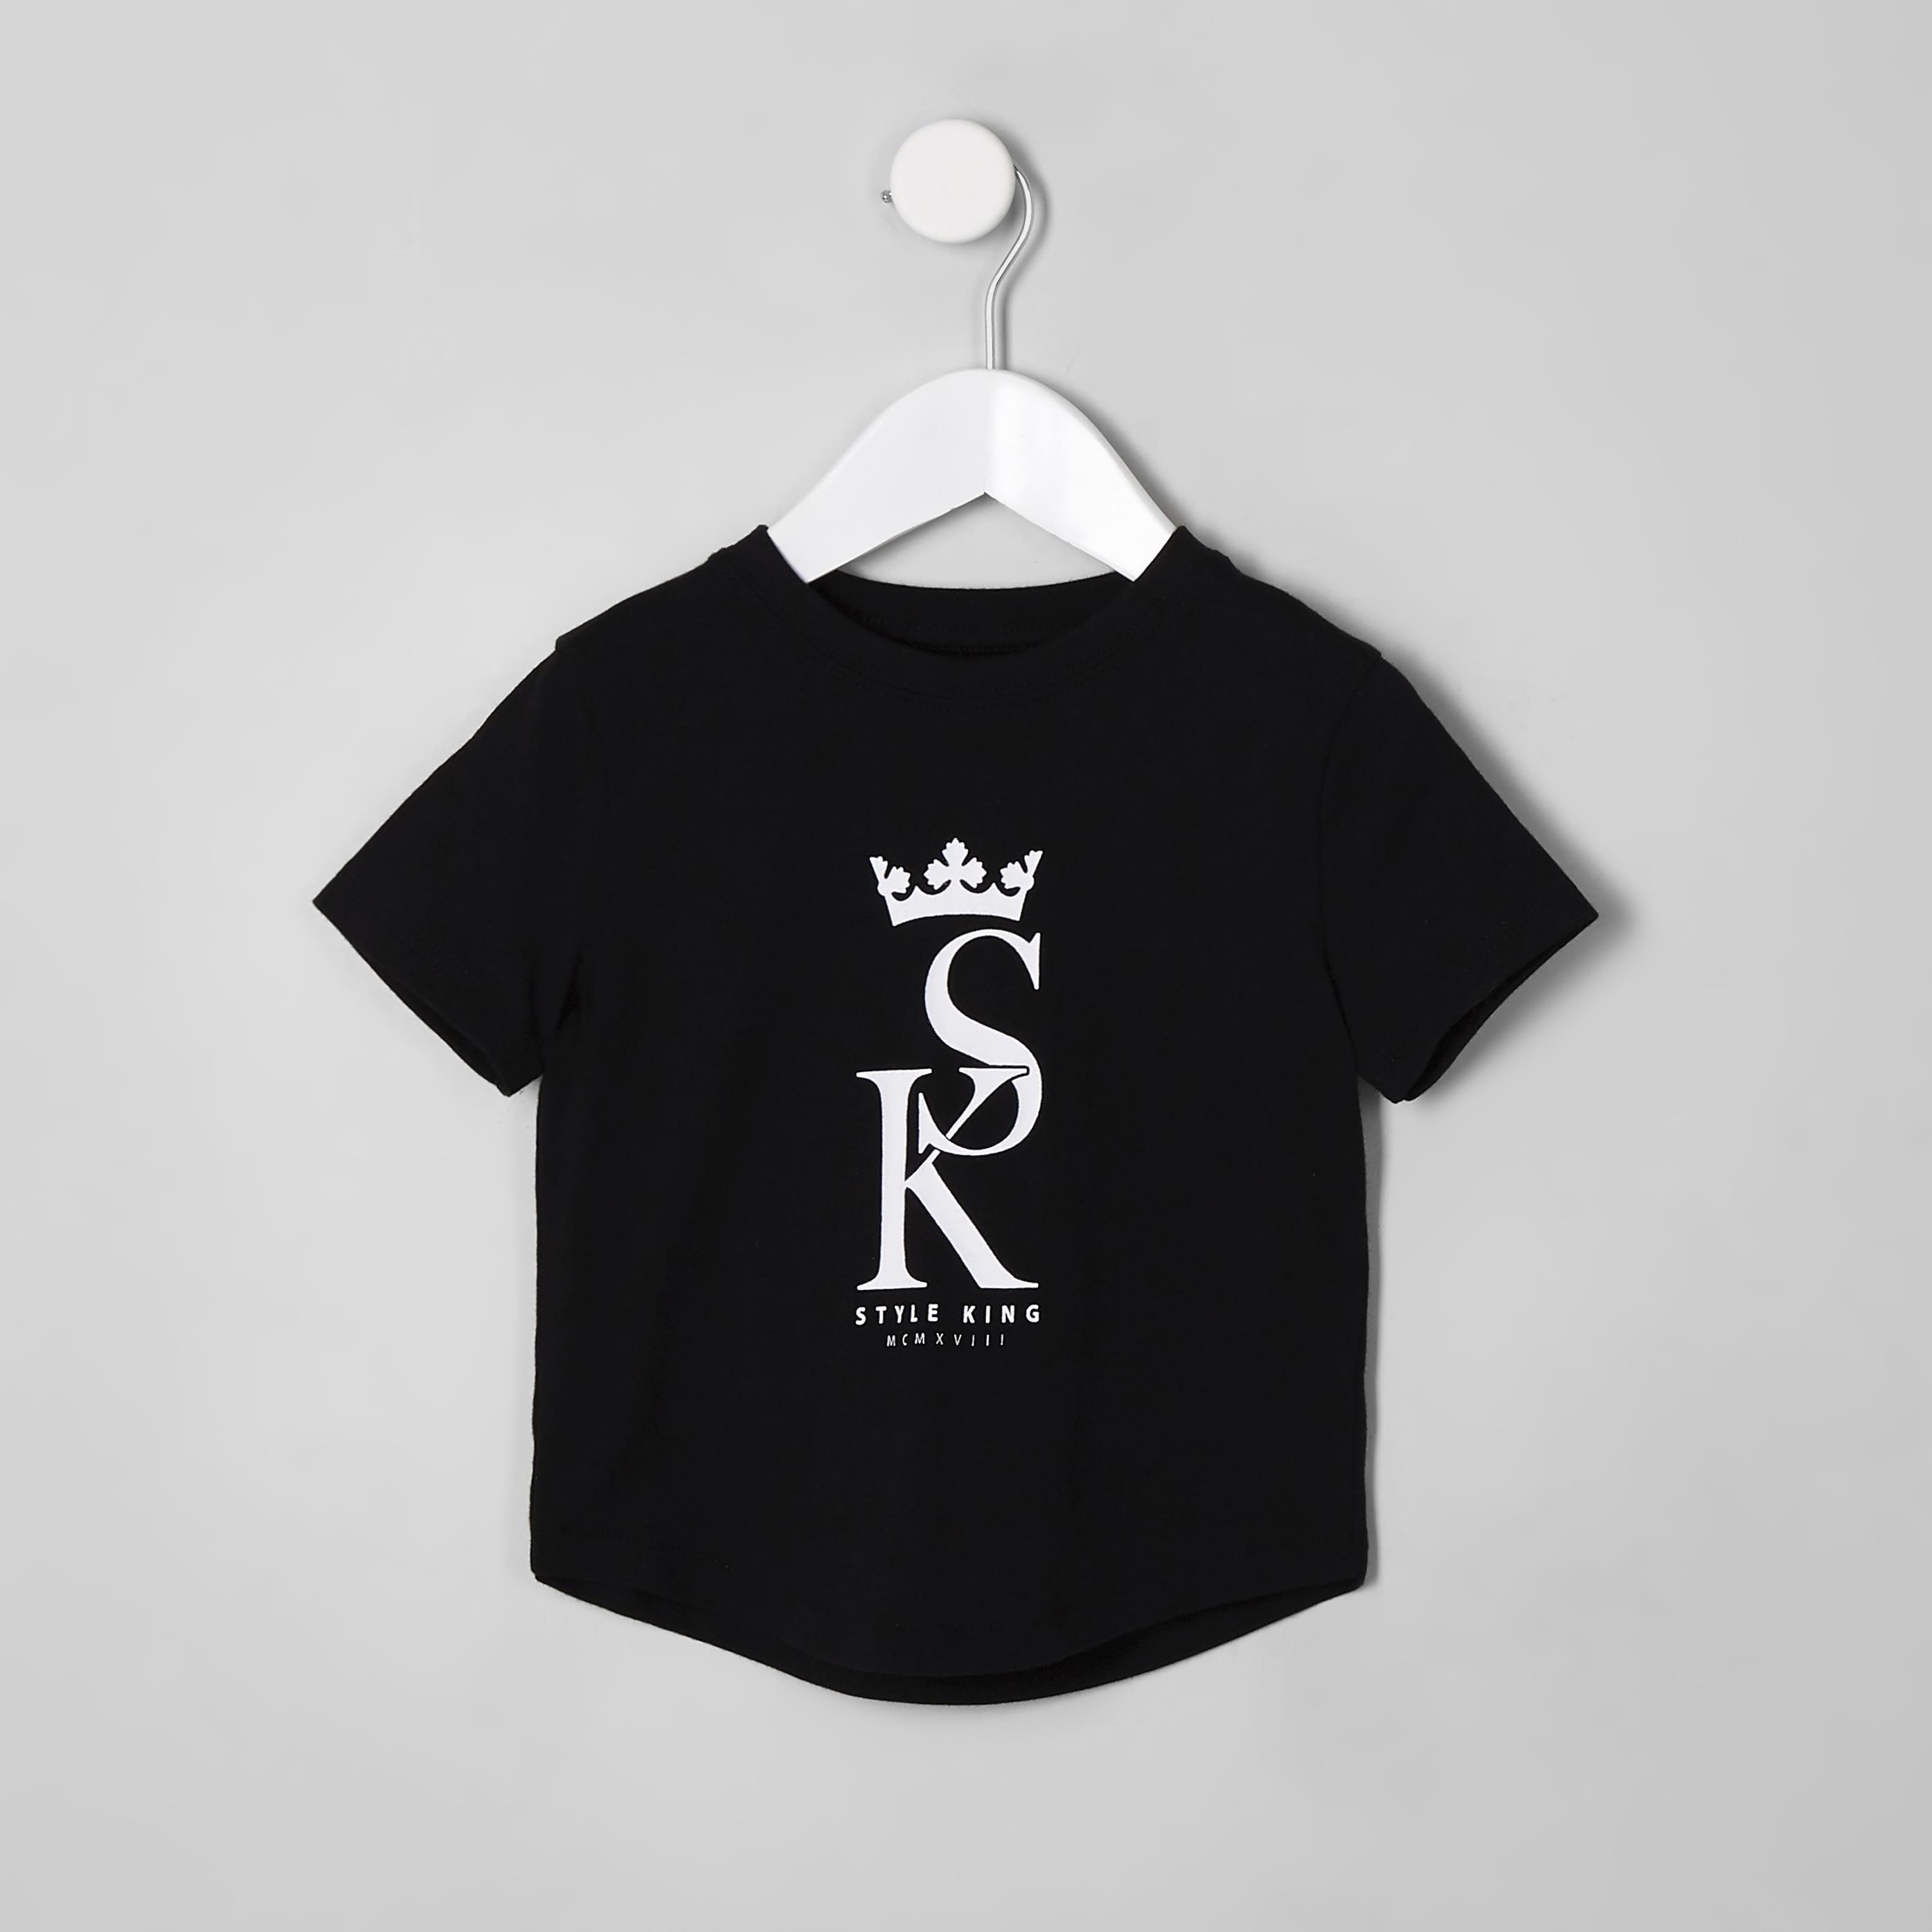 River Island Baby Boys Black 'style king' T-shirt (0-3 Mths)